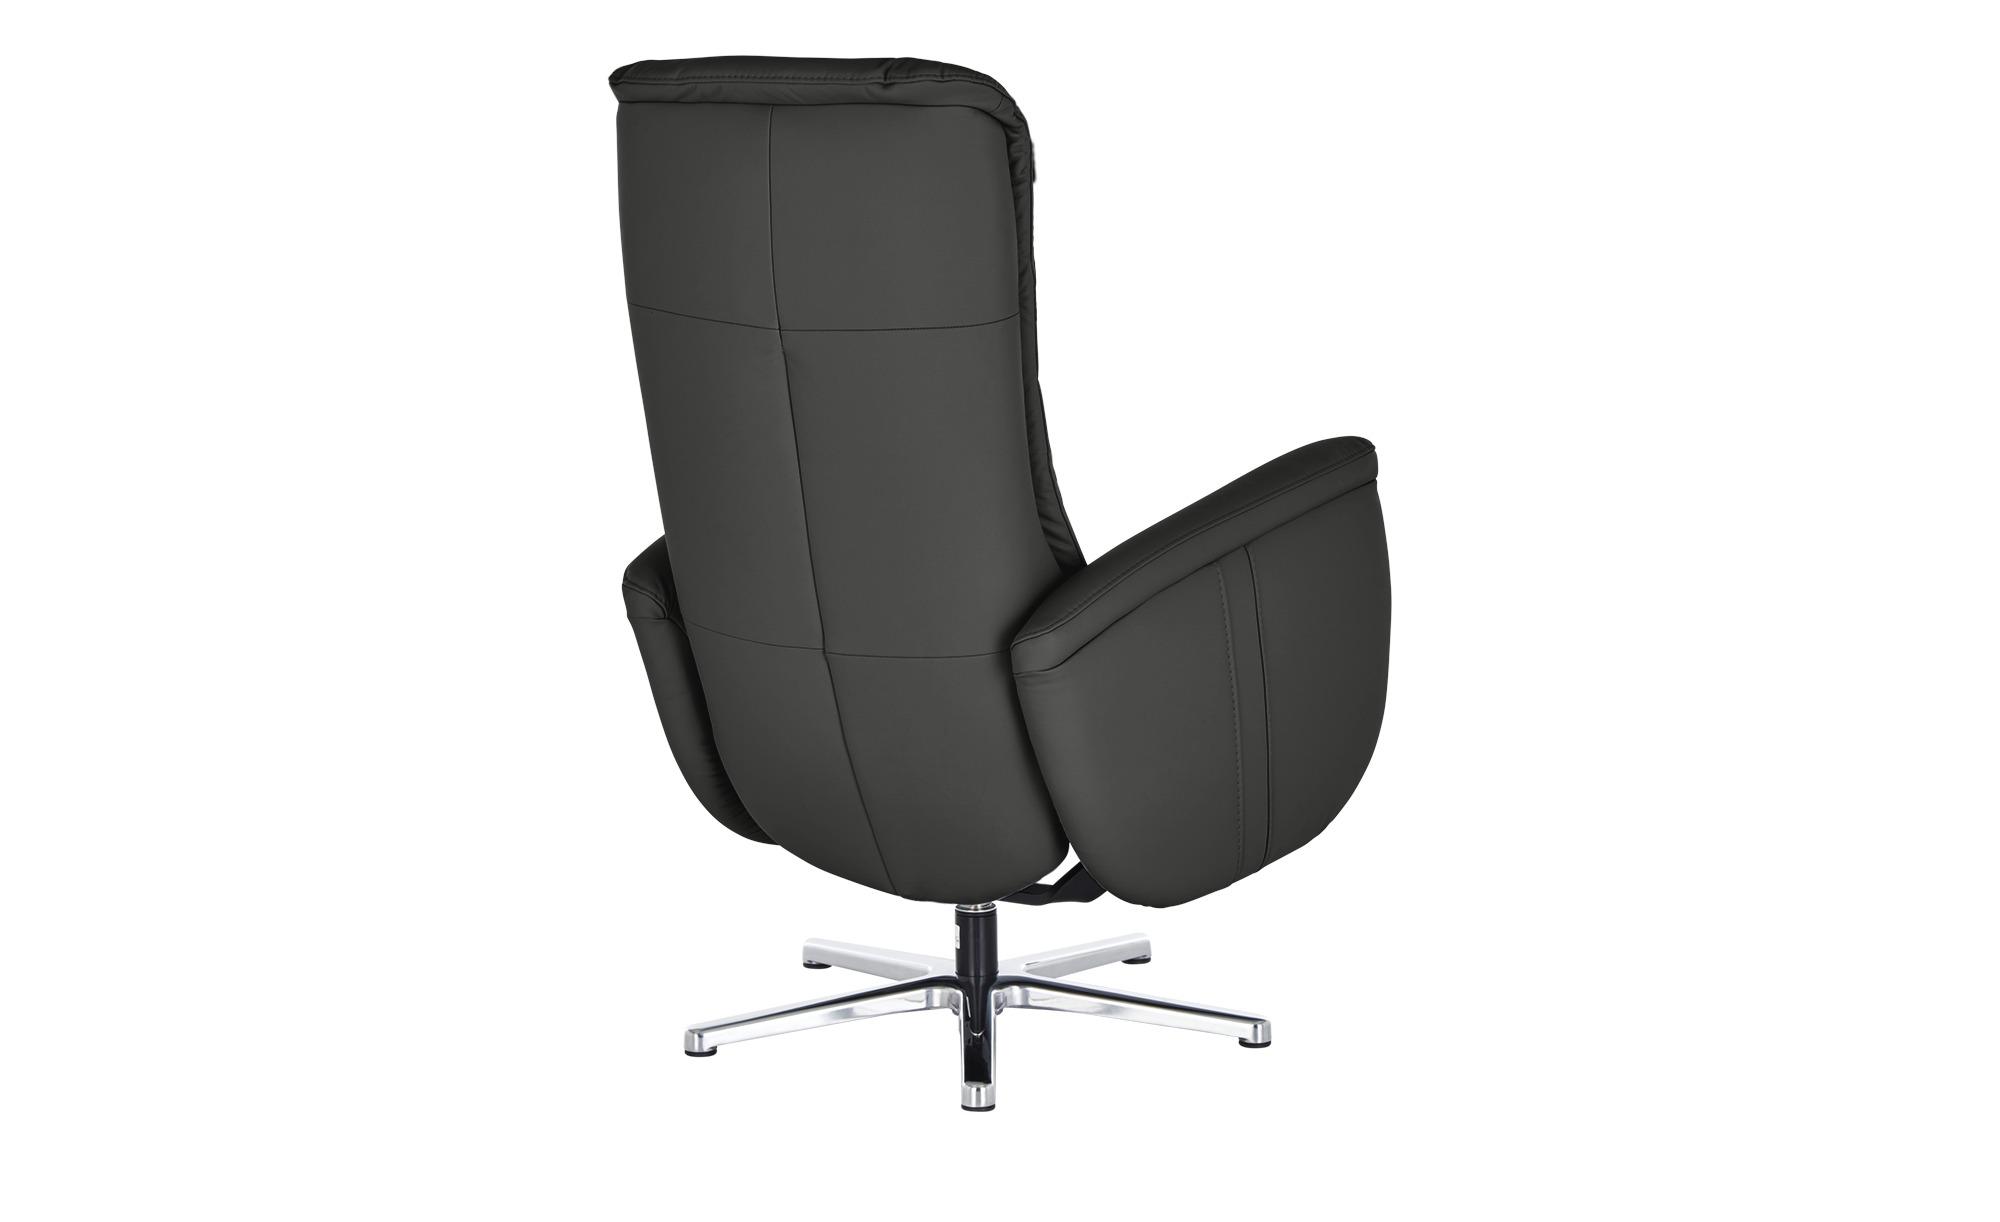 meinSofa Relaxsessel  Franzi-L ¦ schwarz ¦ Maße (cm): B: 71 H: 112 T: 83 Polstermöbel > Sessel > Fernsehsessel - Höffner